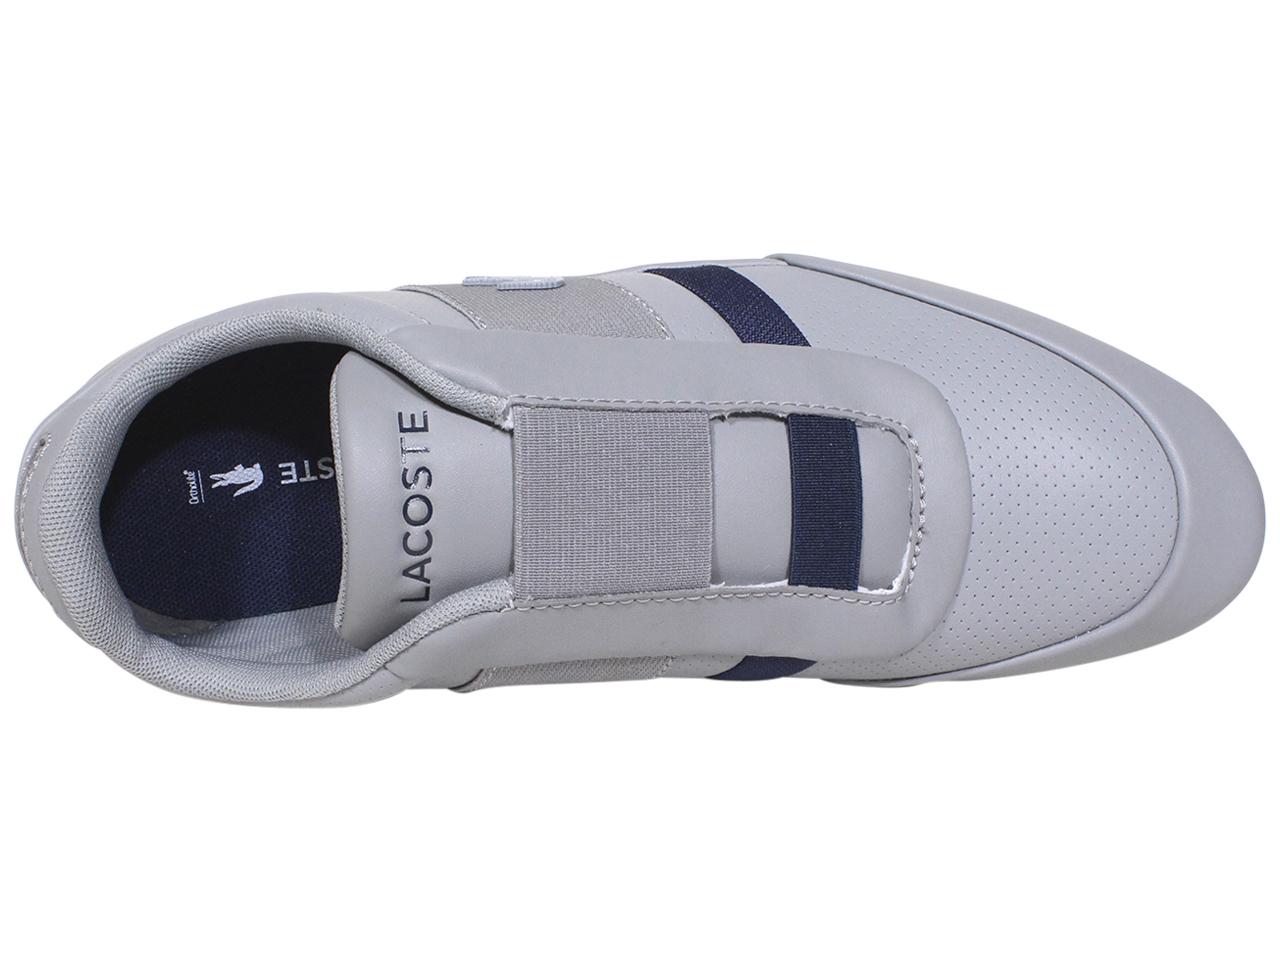 Lacoste-Misano-Elastic-318-Sneakers-Men-039-s-Low-Top-Shoes thumbnail 20